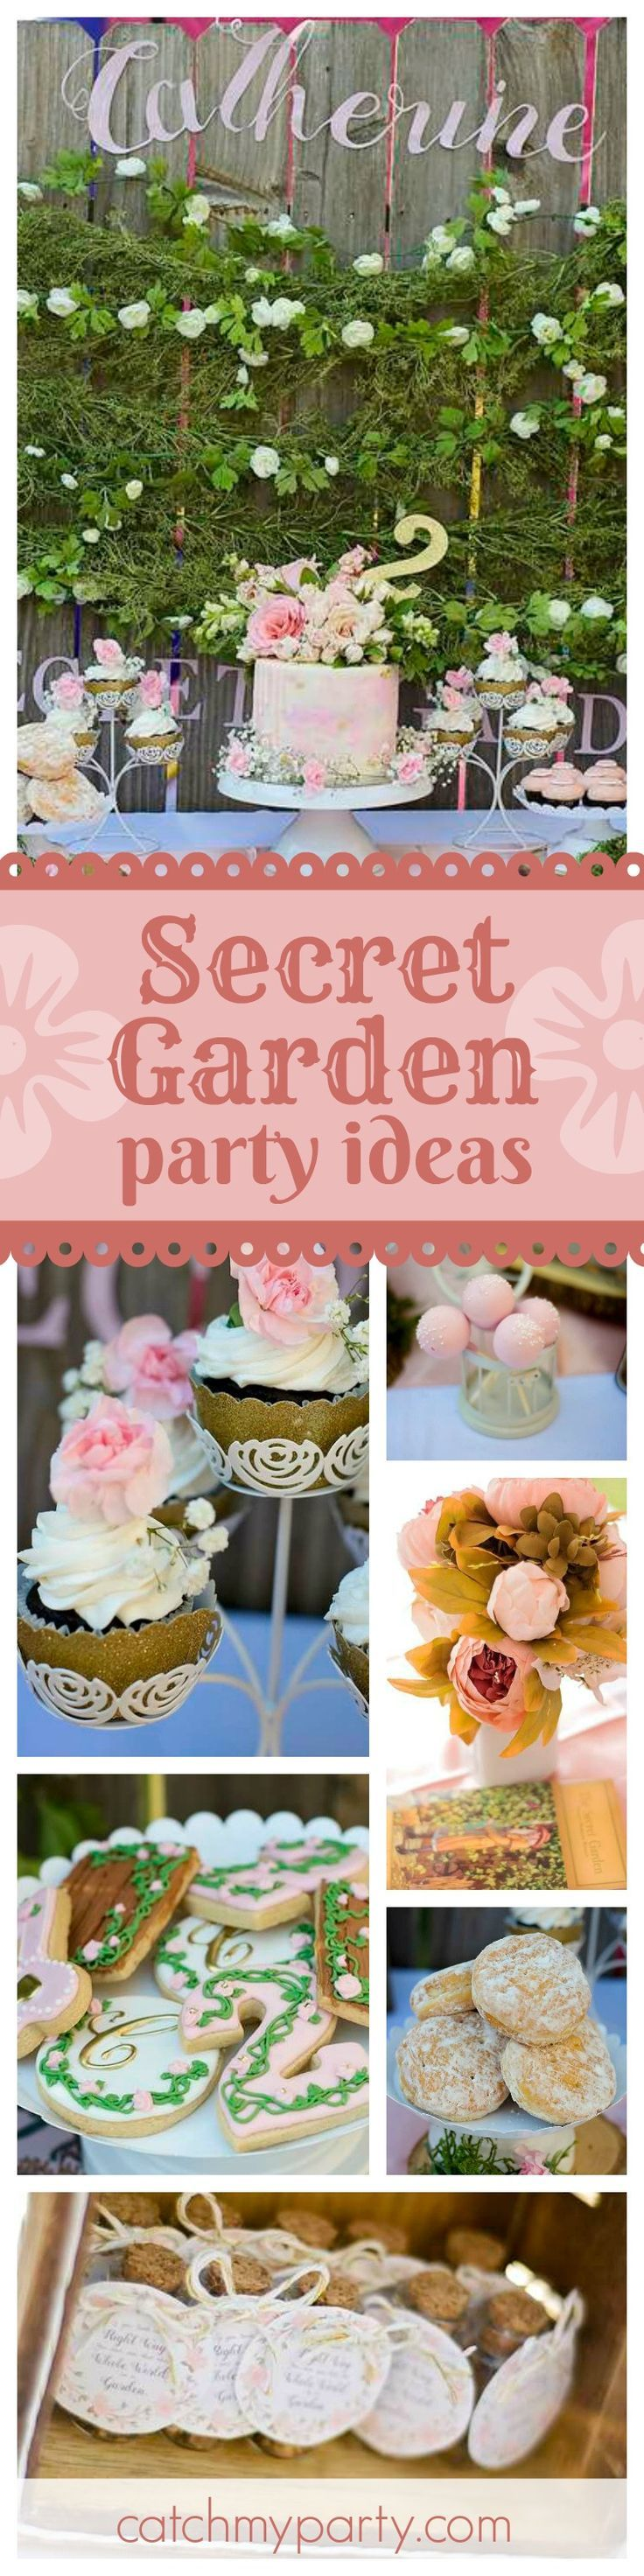 Best 25 Garden birthday cake ideas on Pinterest Garden cakes